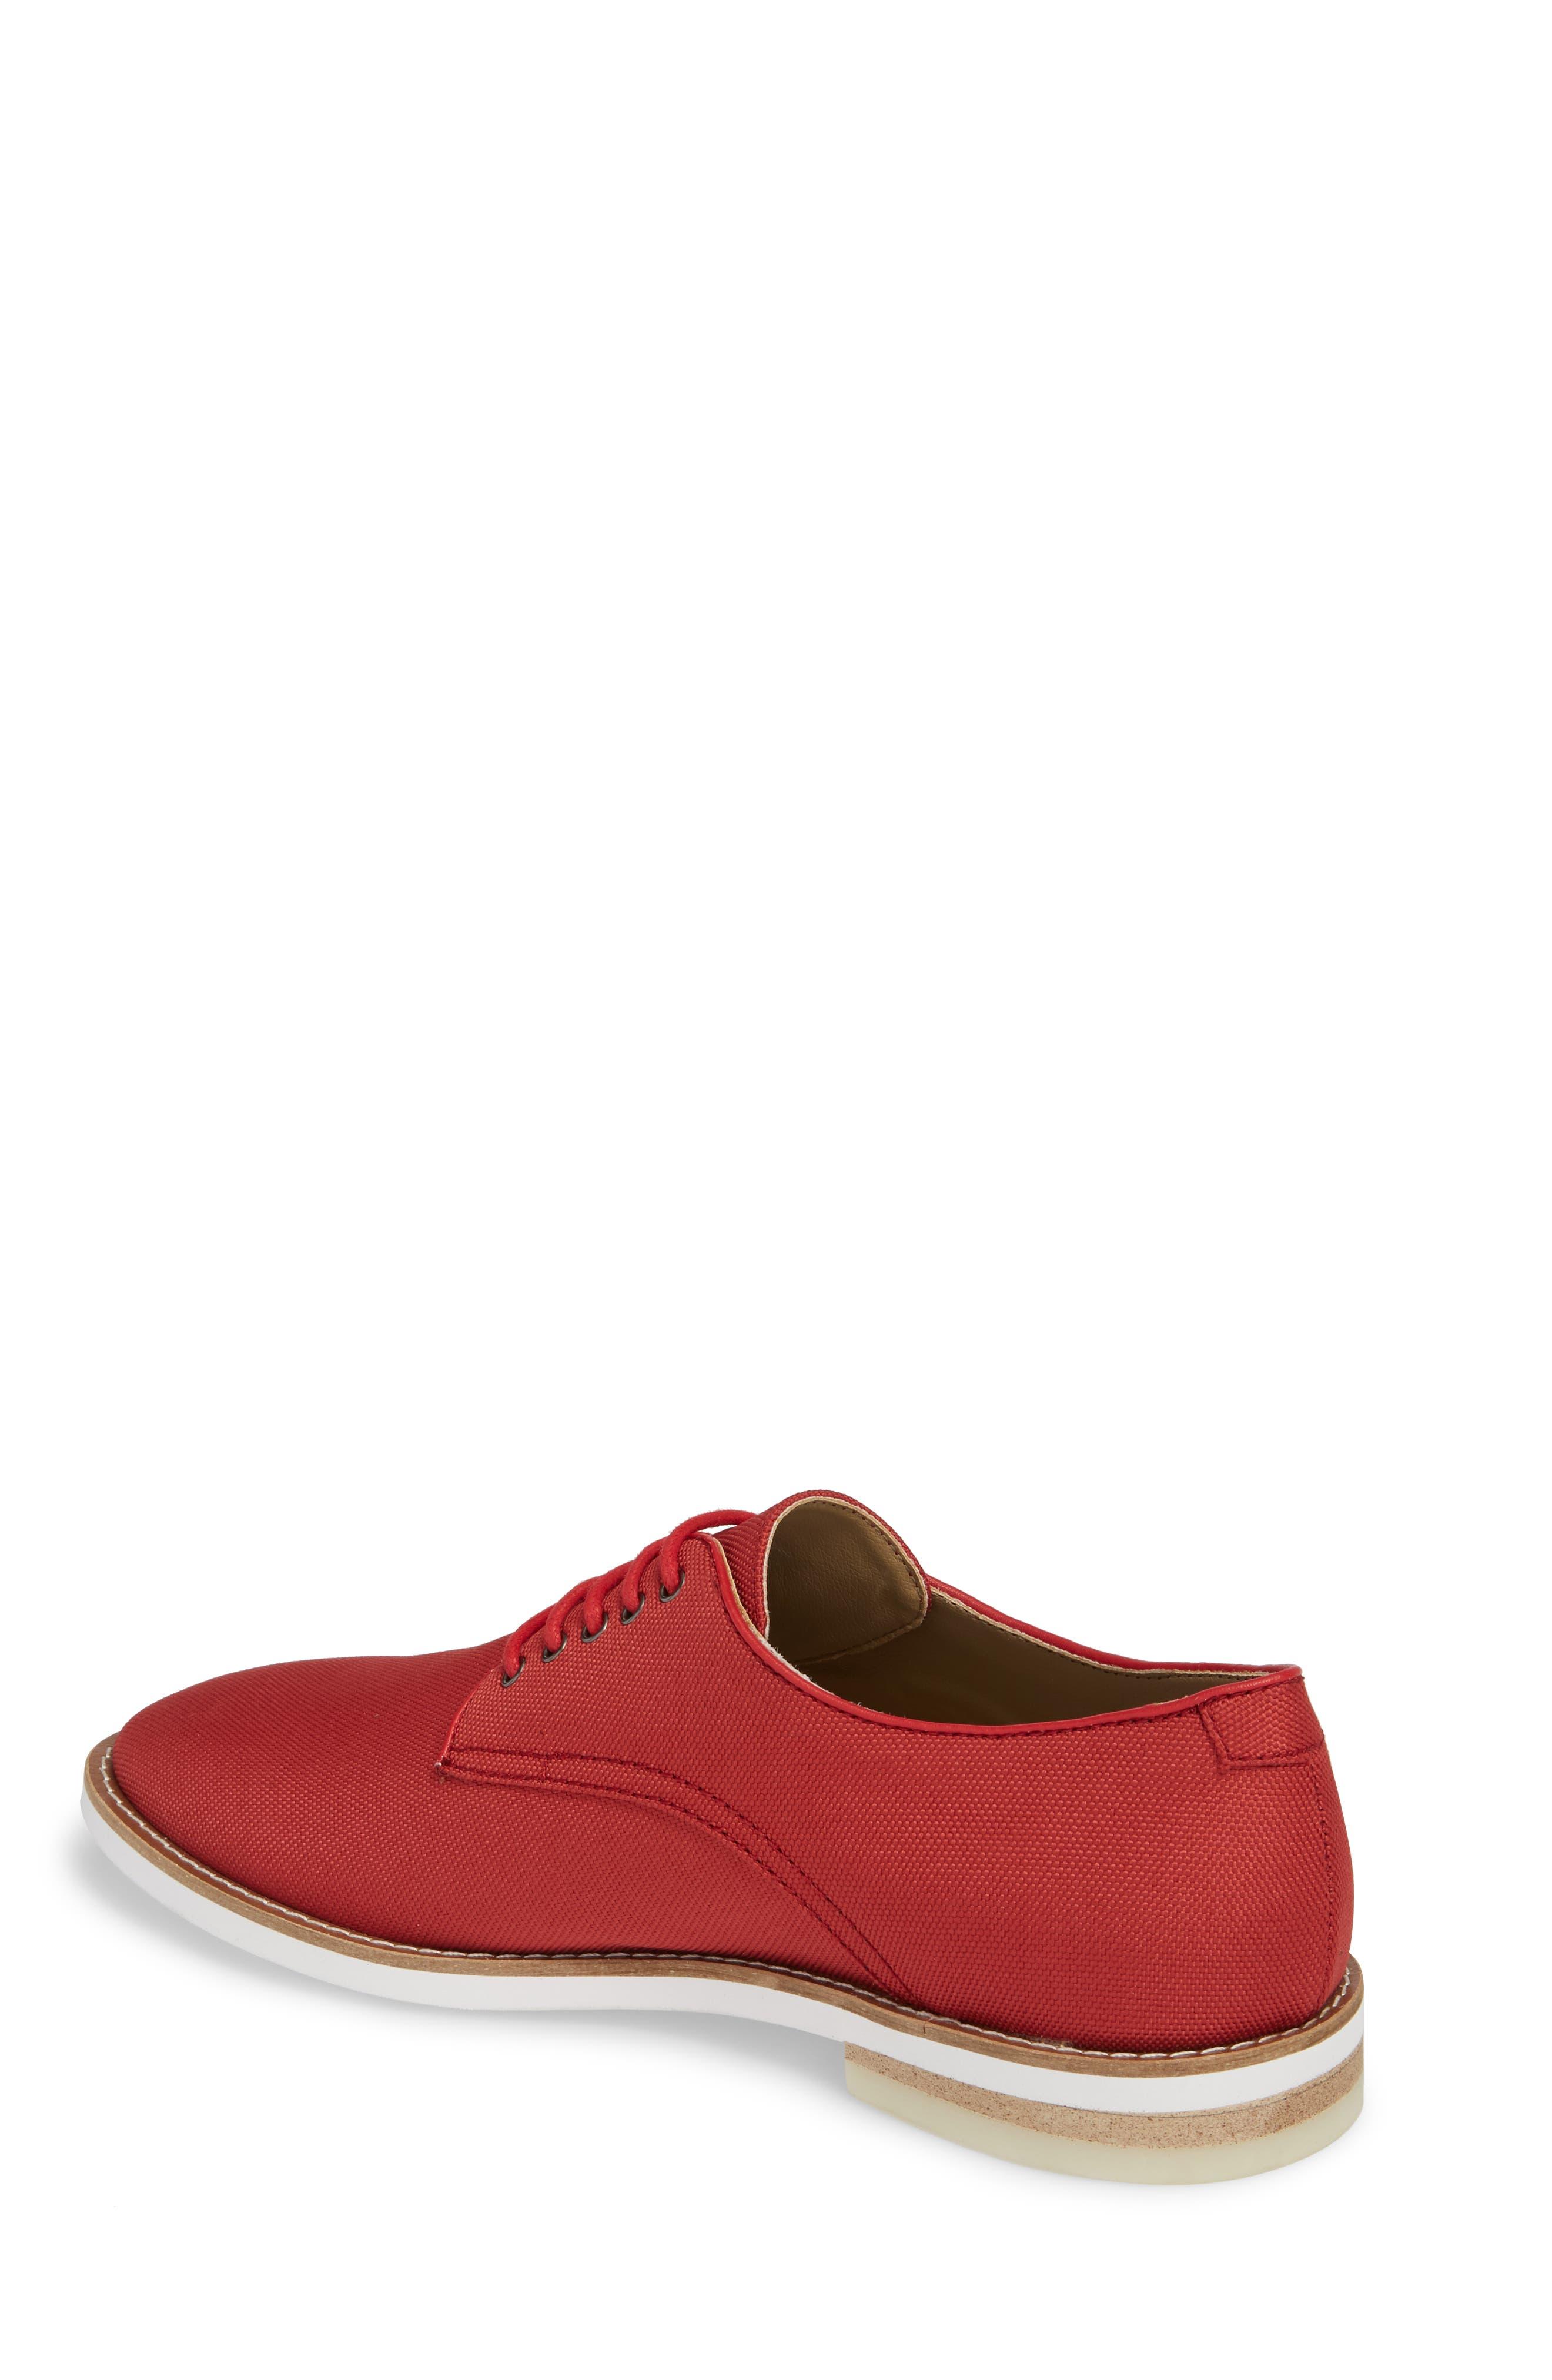 Atlee Plain Toe Derby,                             Alternate thumbnail 2, color,                             Brick Red Nylon